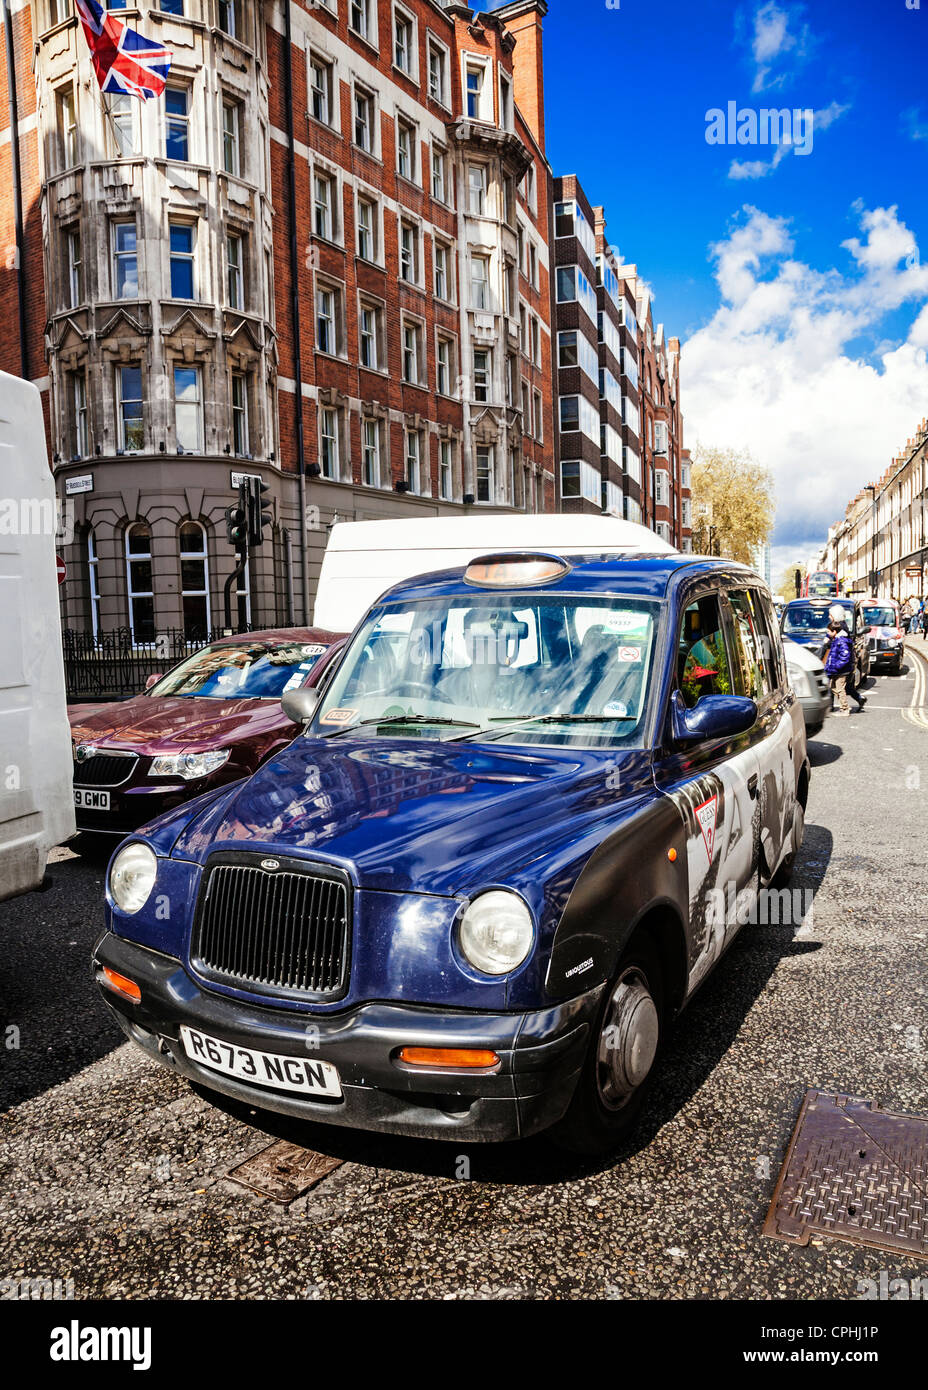 Taxi de Londres, Londres, Angleterre. Photo Stock